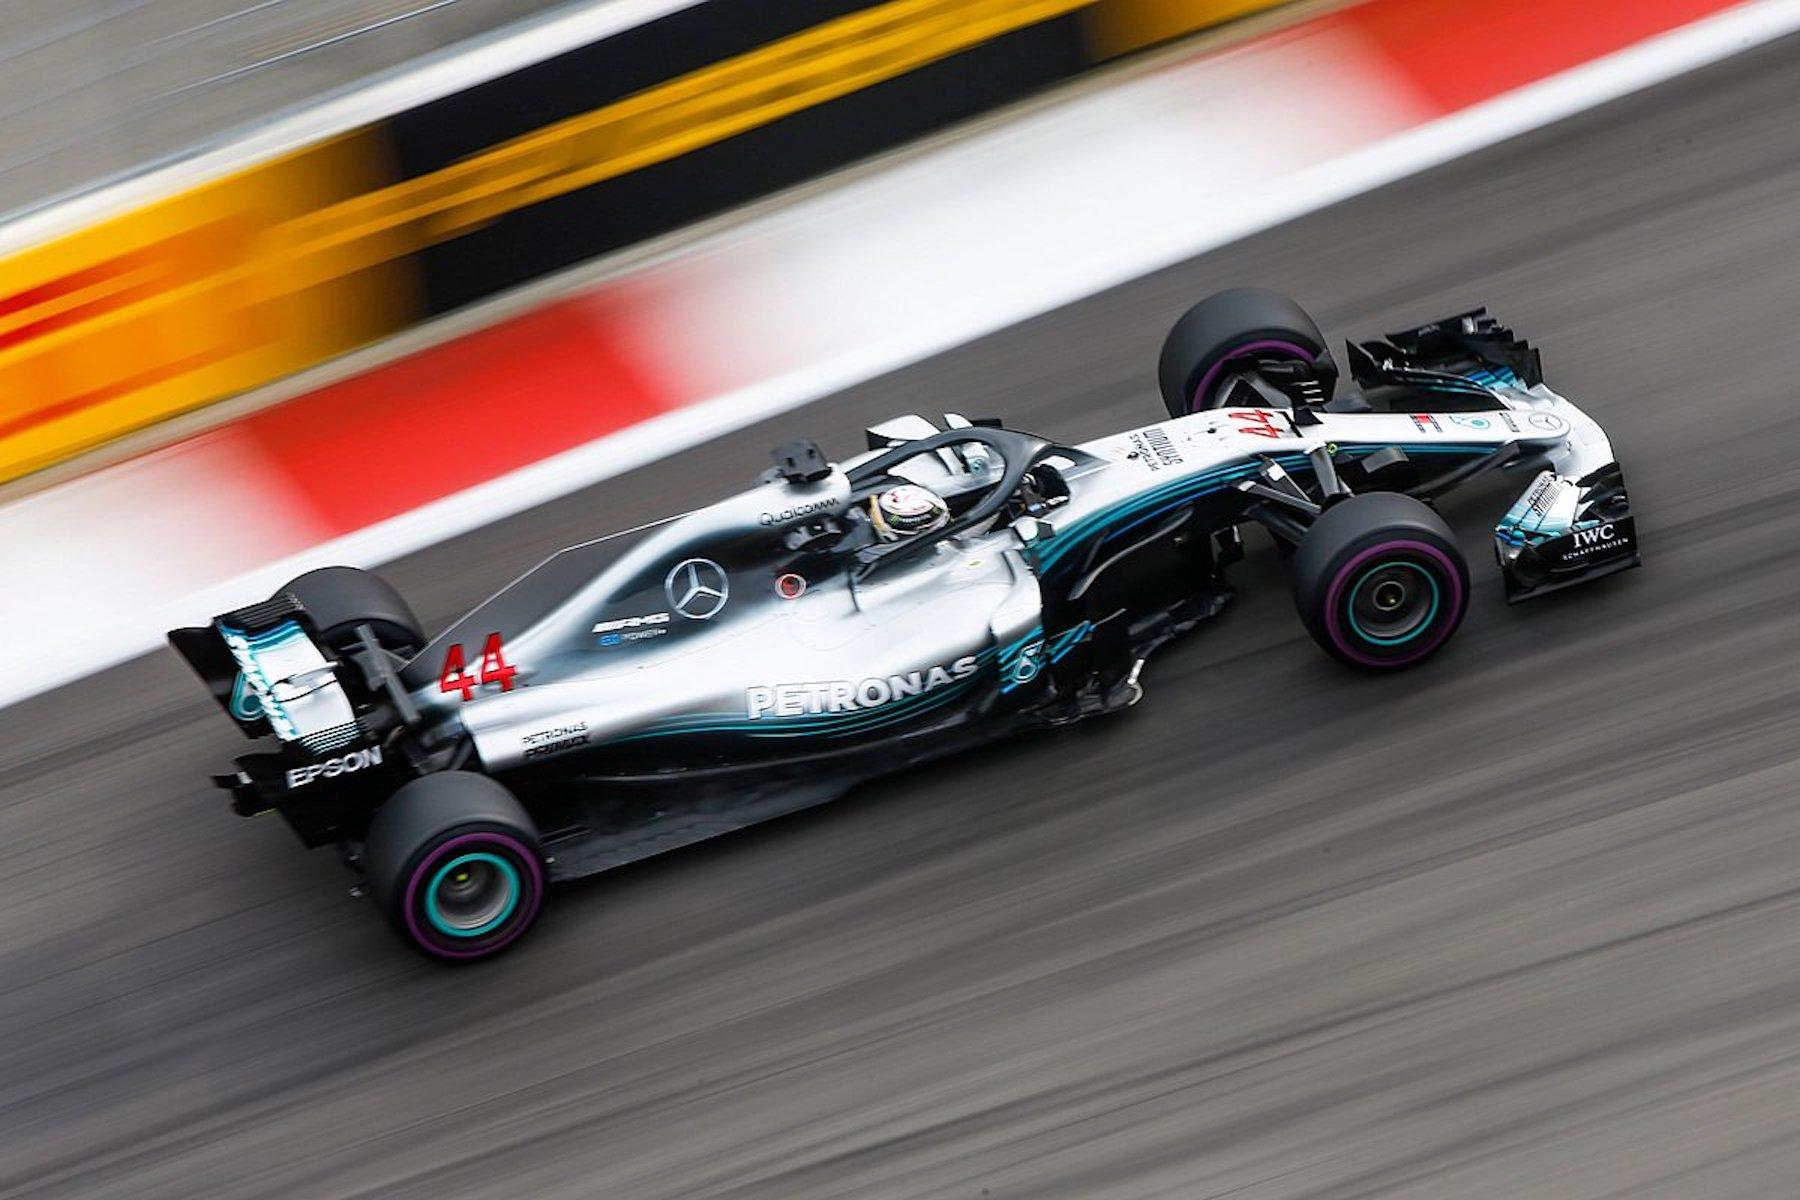 2018 Lewis Hamilton | Mercedes W09 | 2018 Russian GP FP2 2a copy.jpg